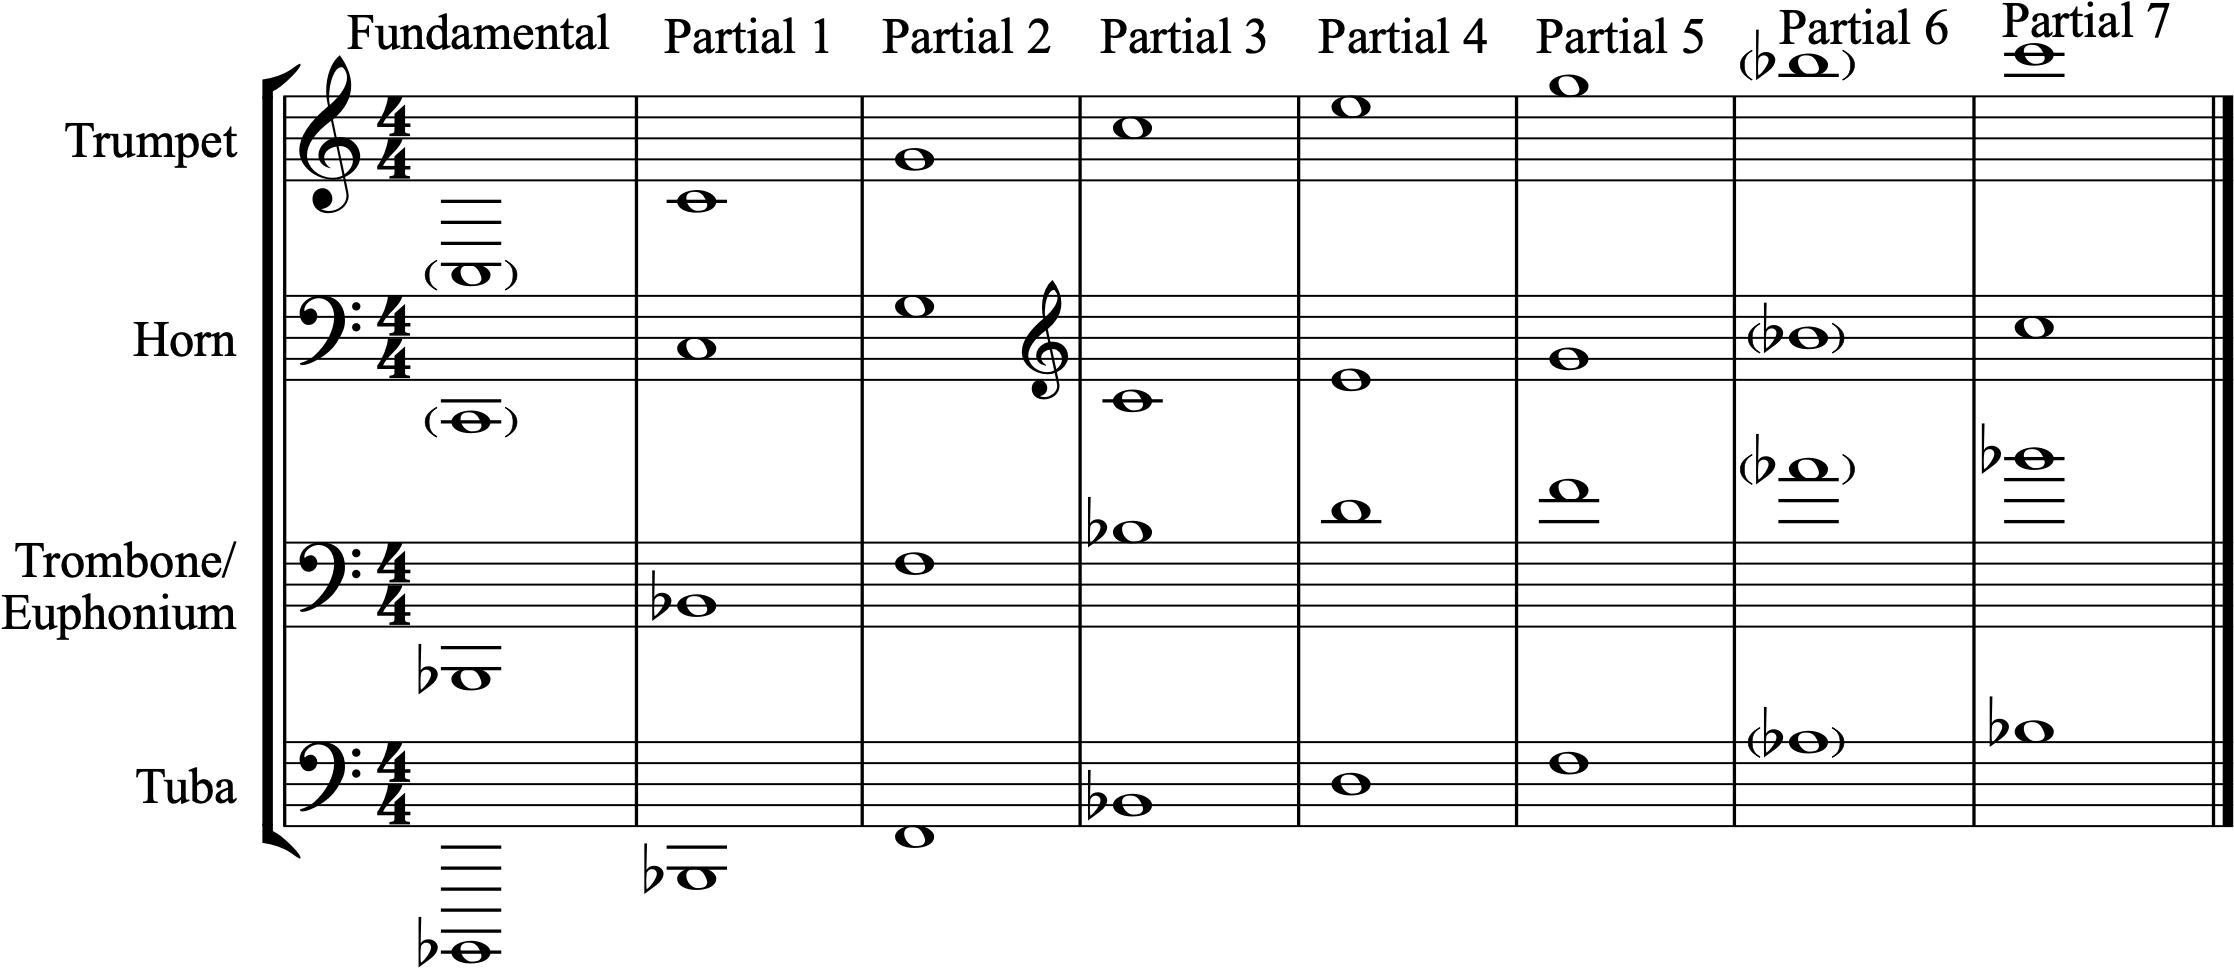 Partials of brass instruments